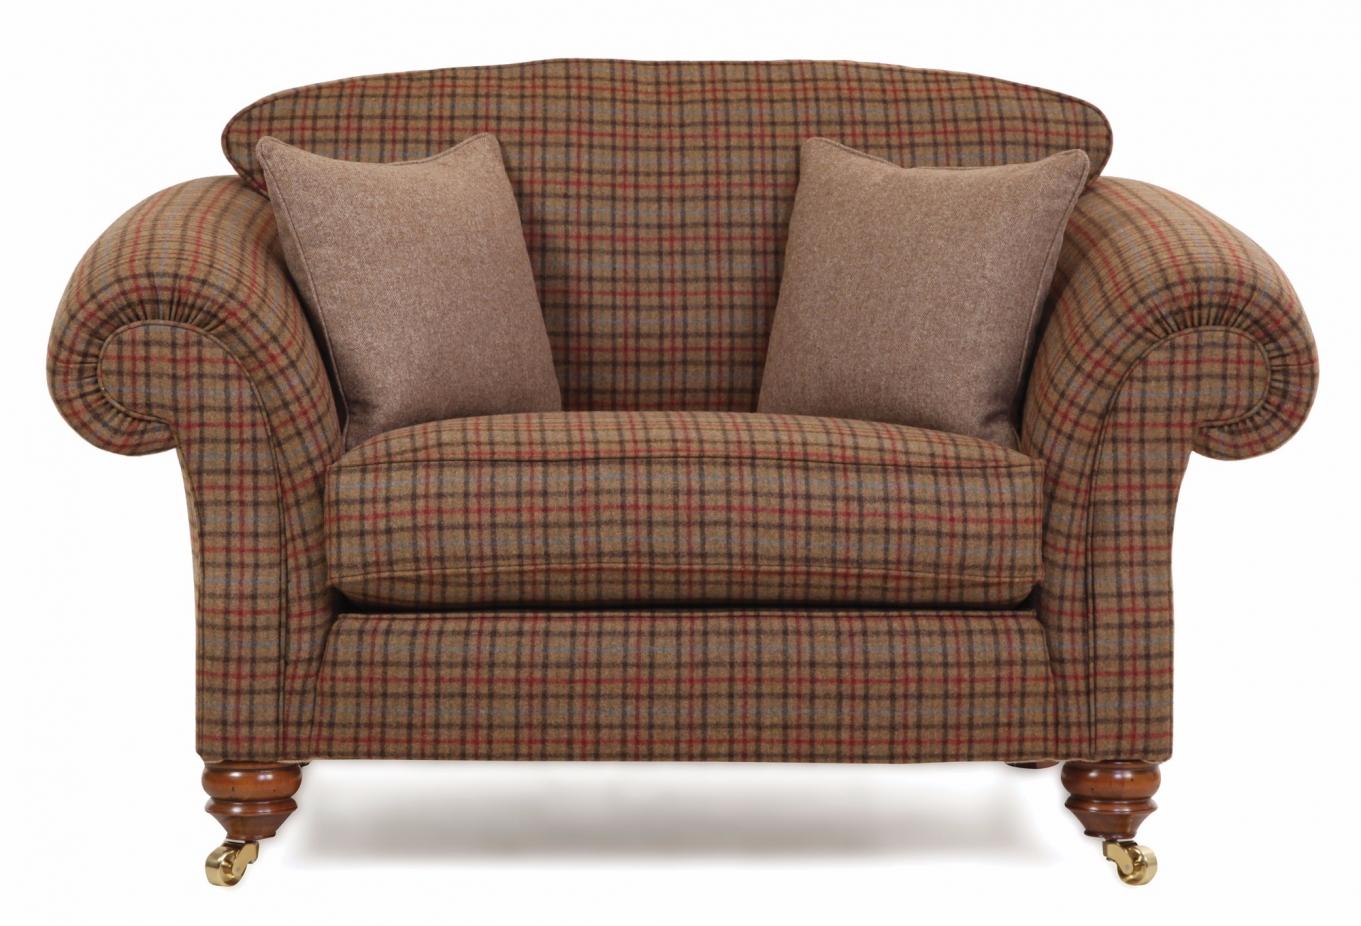 Raphael 1.5 seat sofa